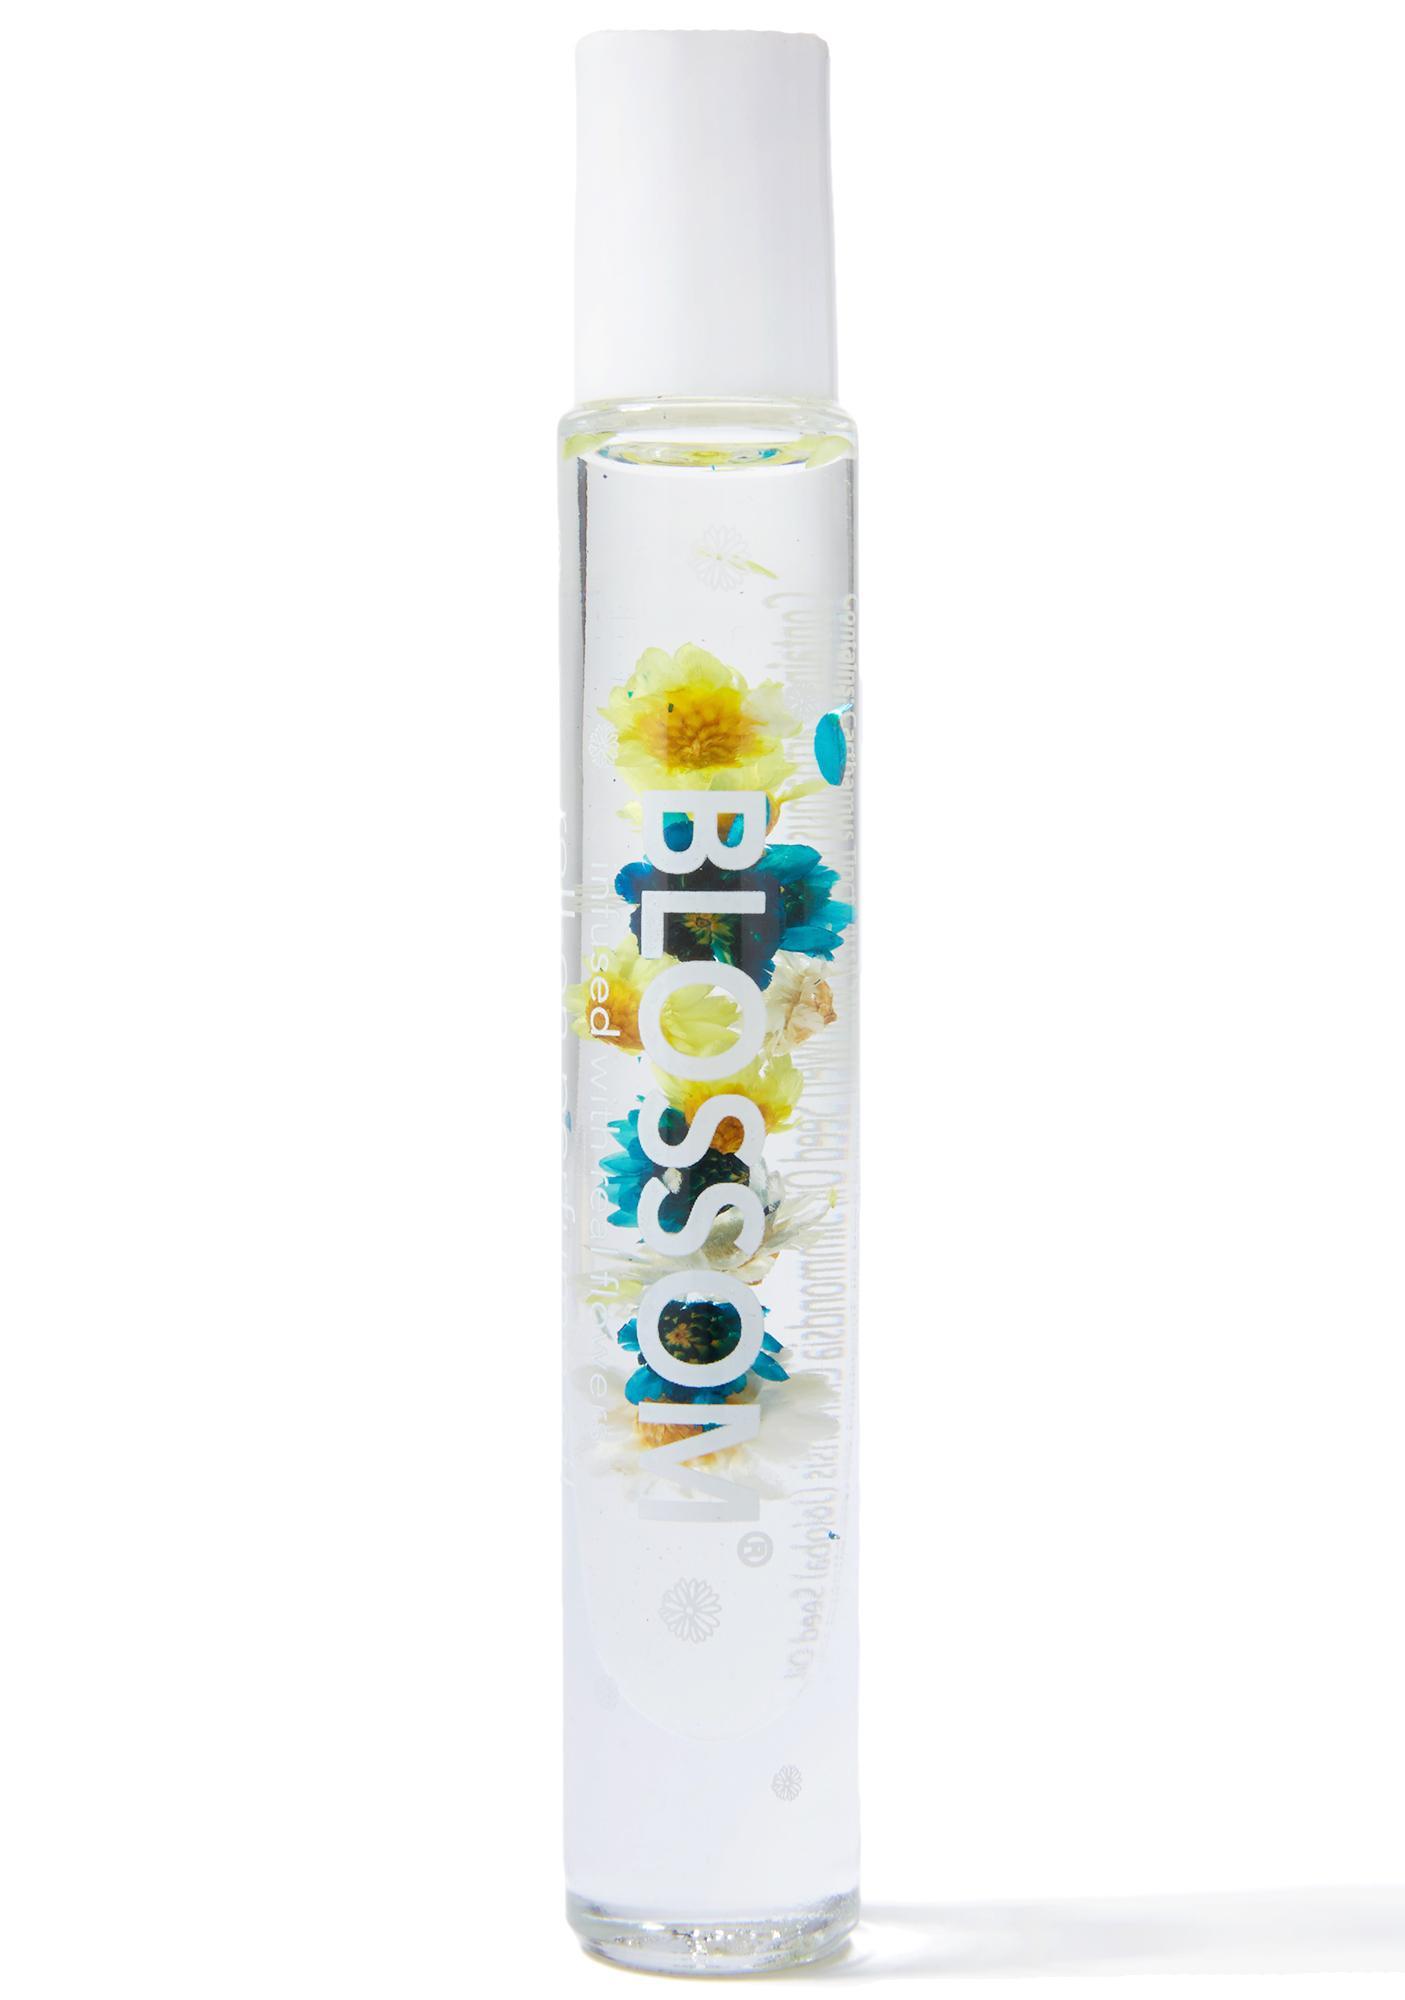 Blossom Vanilla Orchid Roll On Perfume